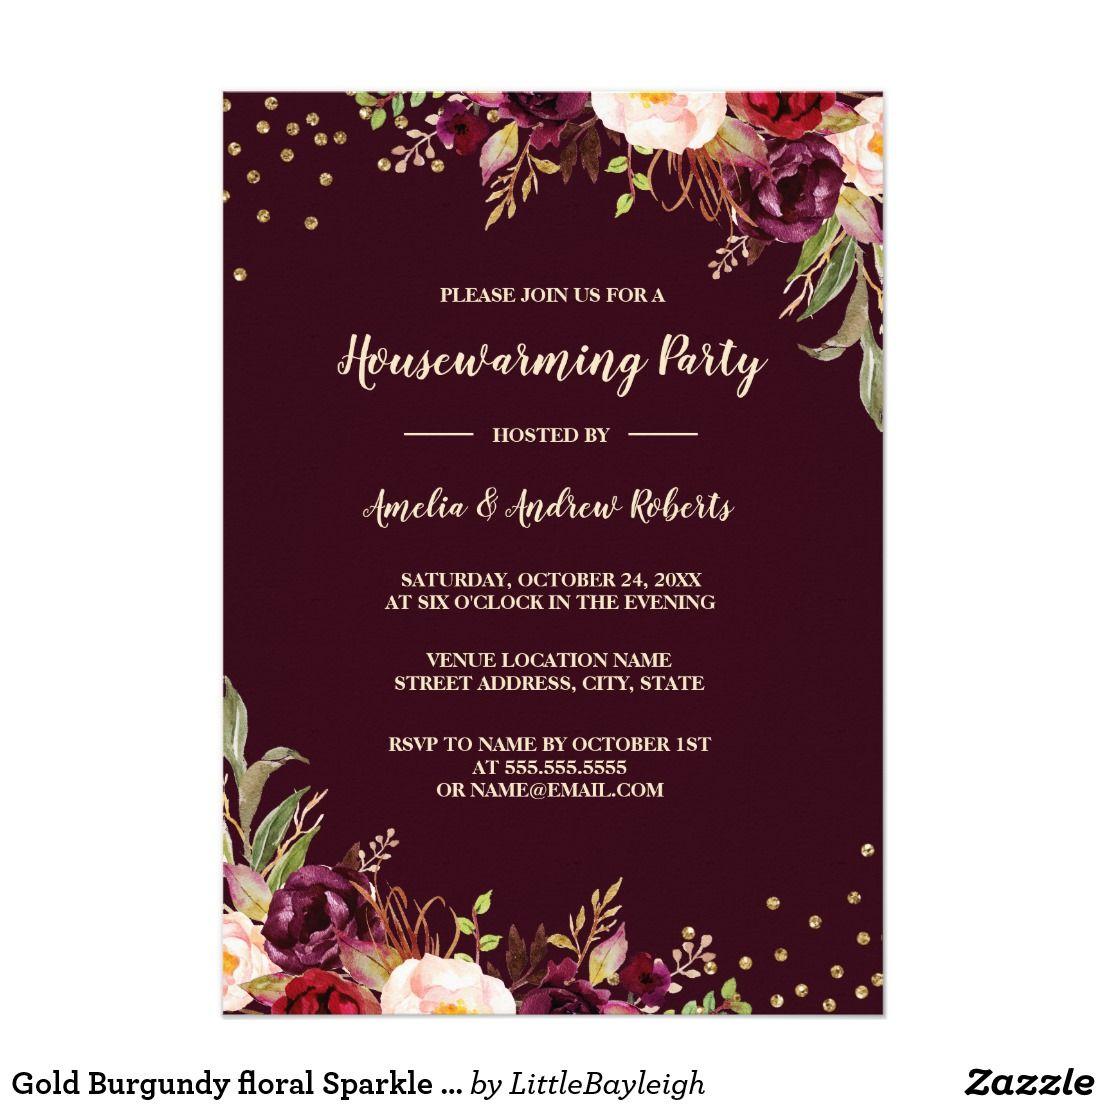 Gold Burgundy floral Sparkle Housewarming Party Card